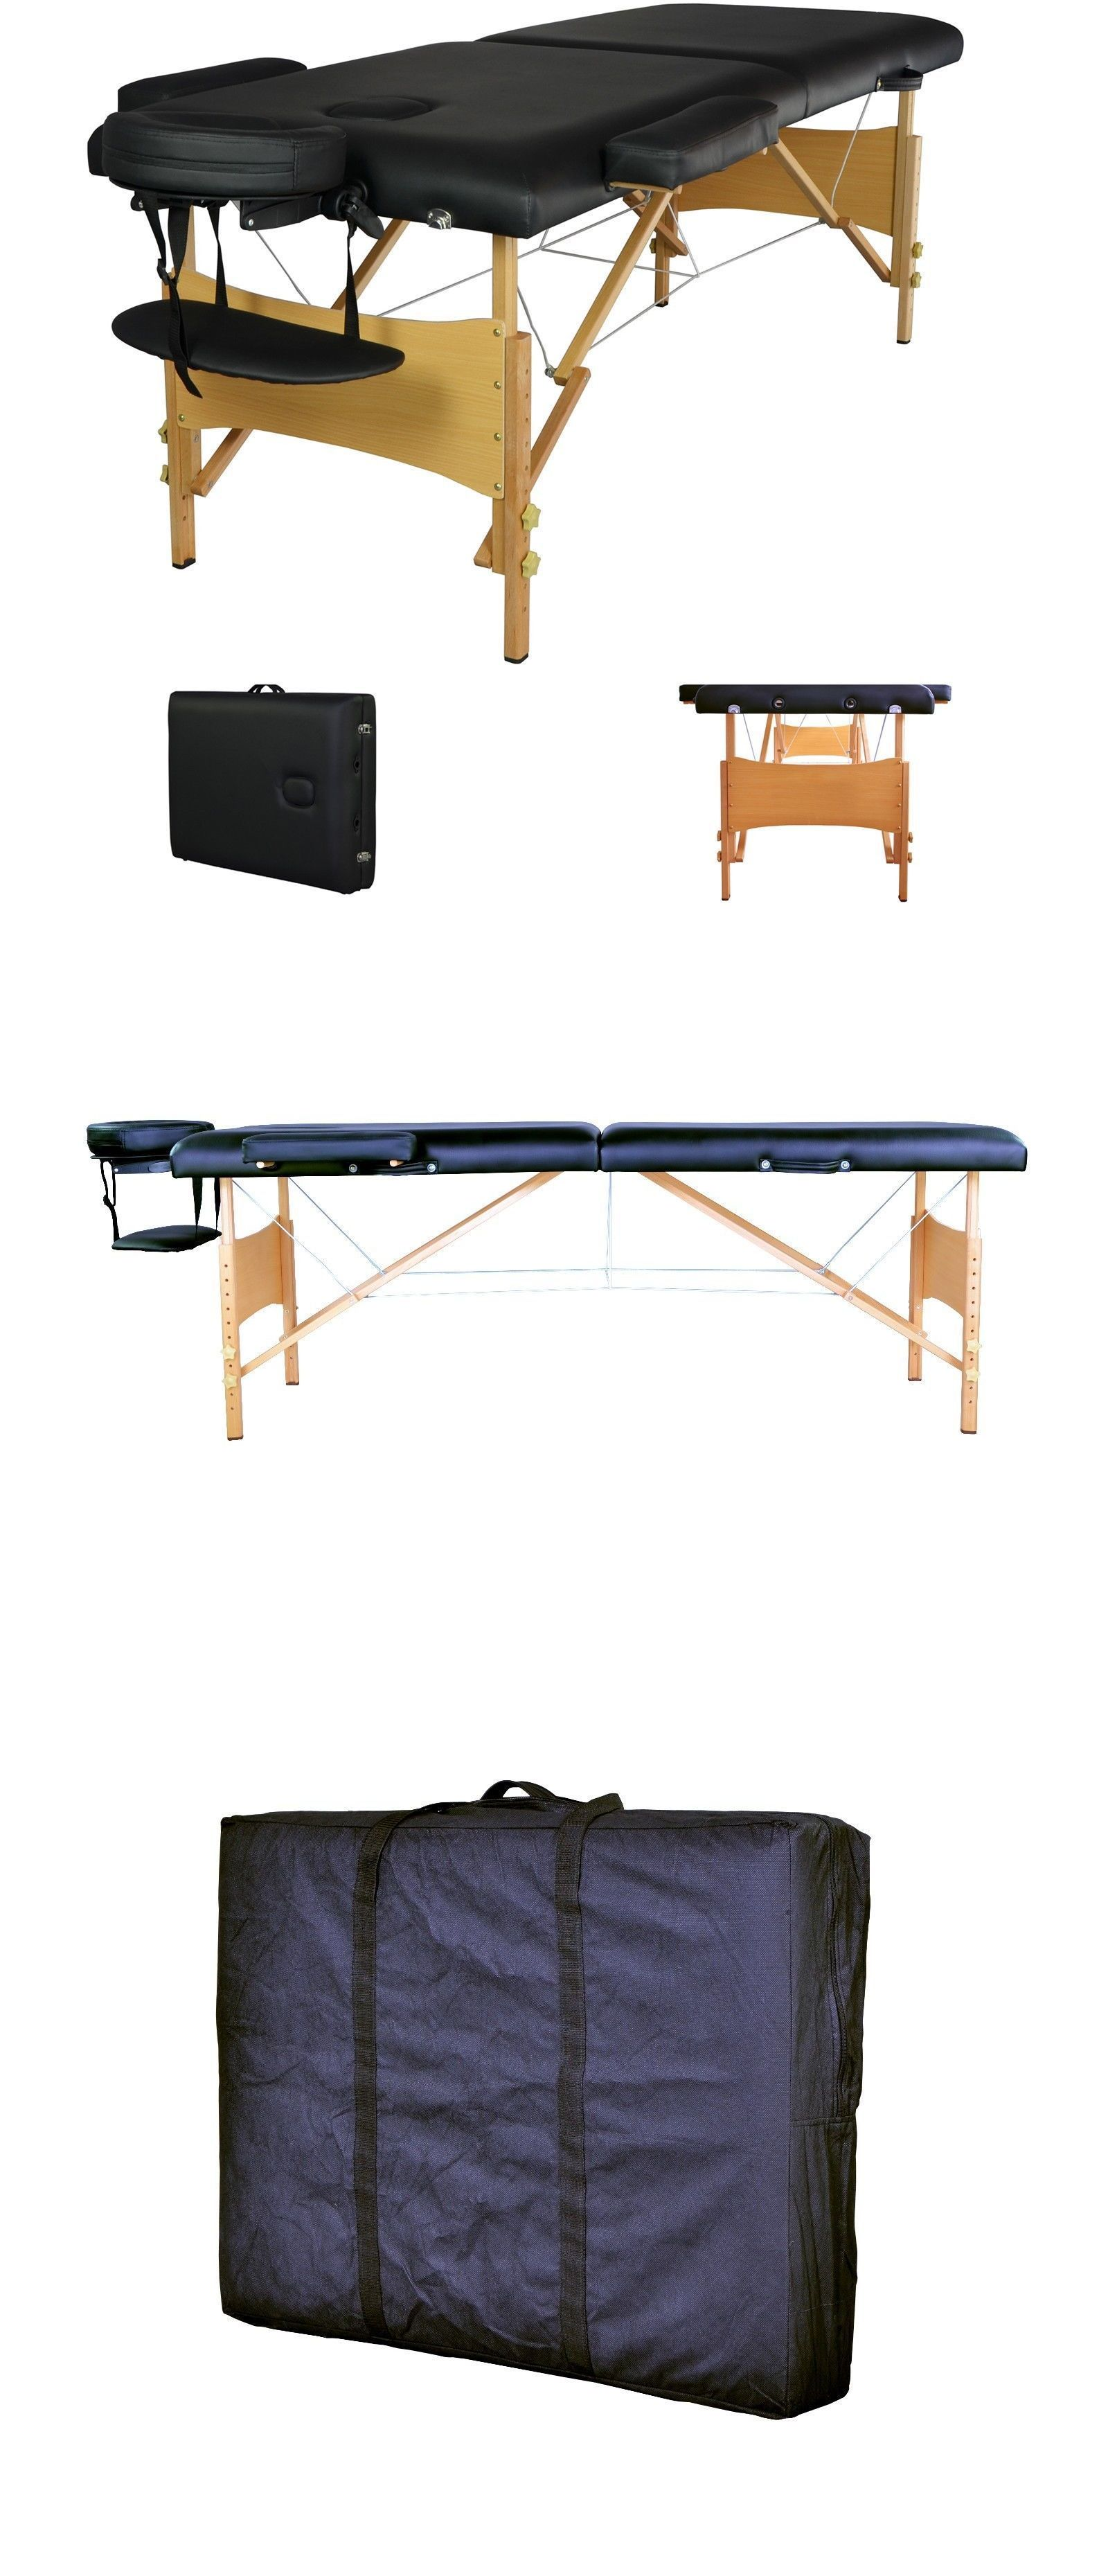 Eyelash Tools Eyelash Extension Training Bed Table Kit